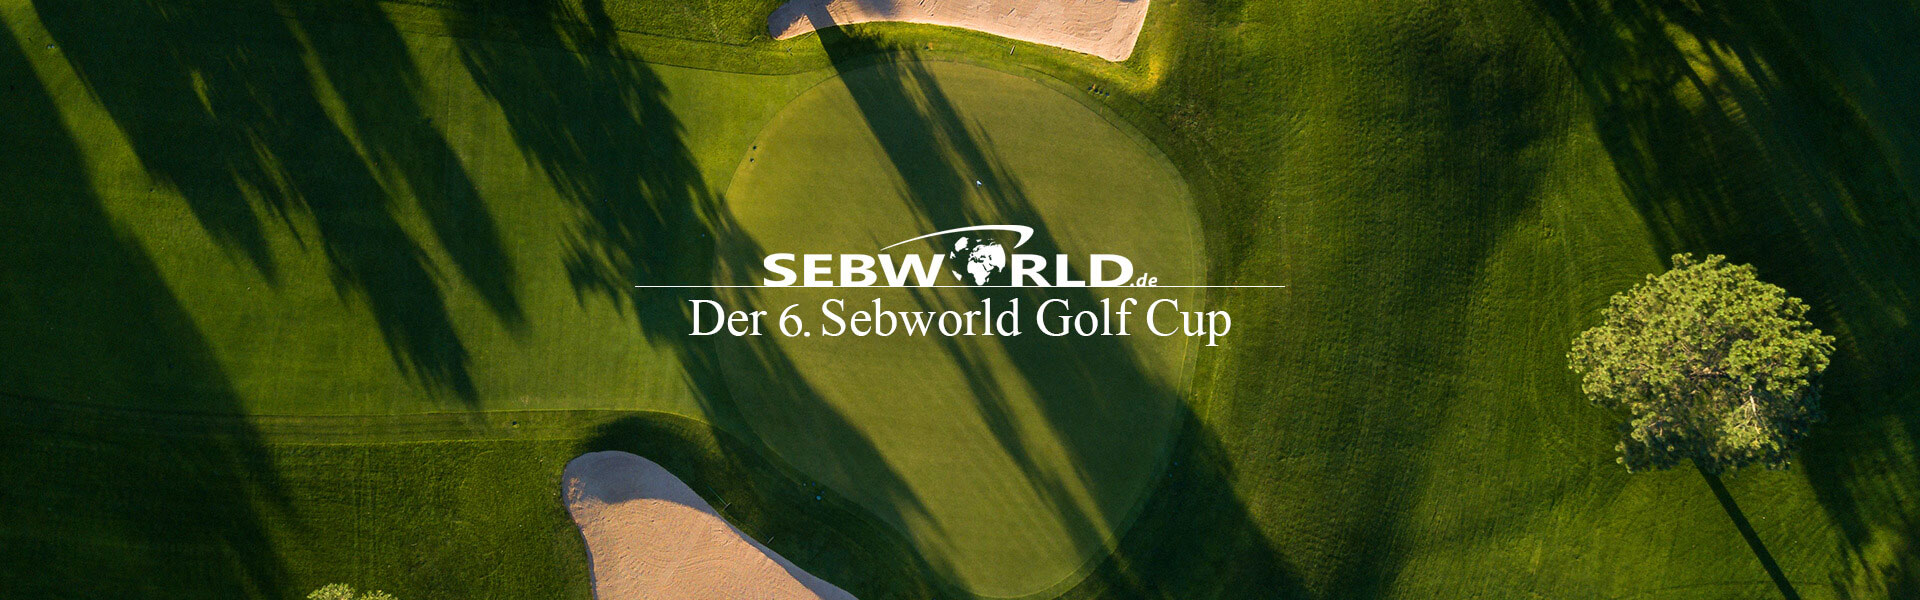 media/image/6-sebworld-golf-cup-2021.jpg